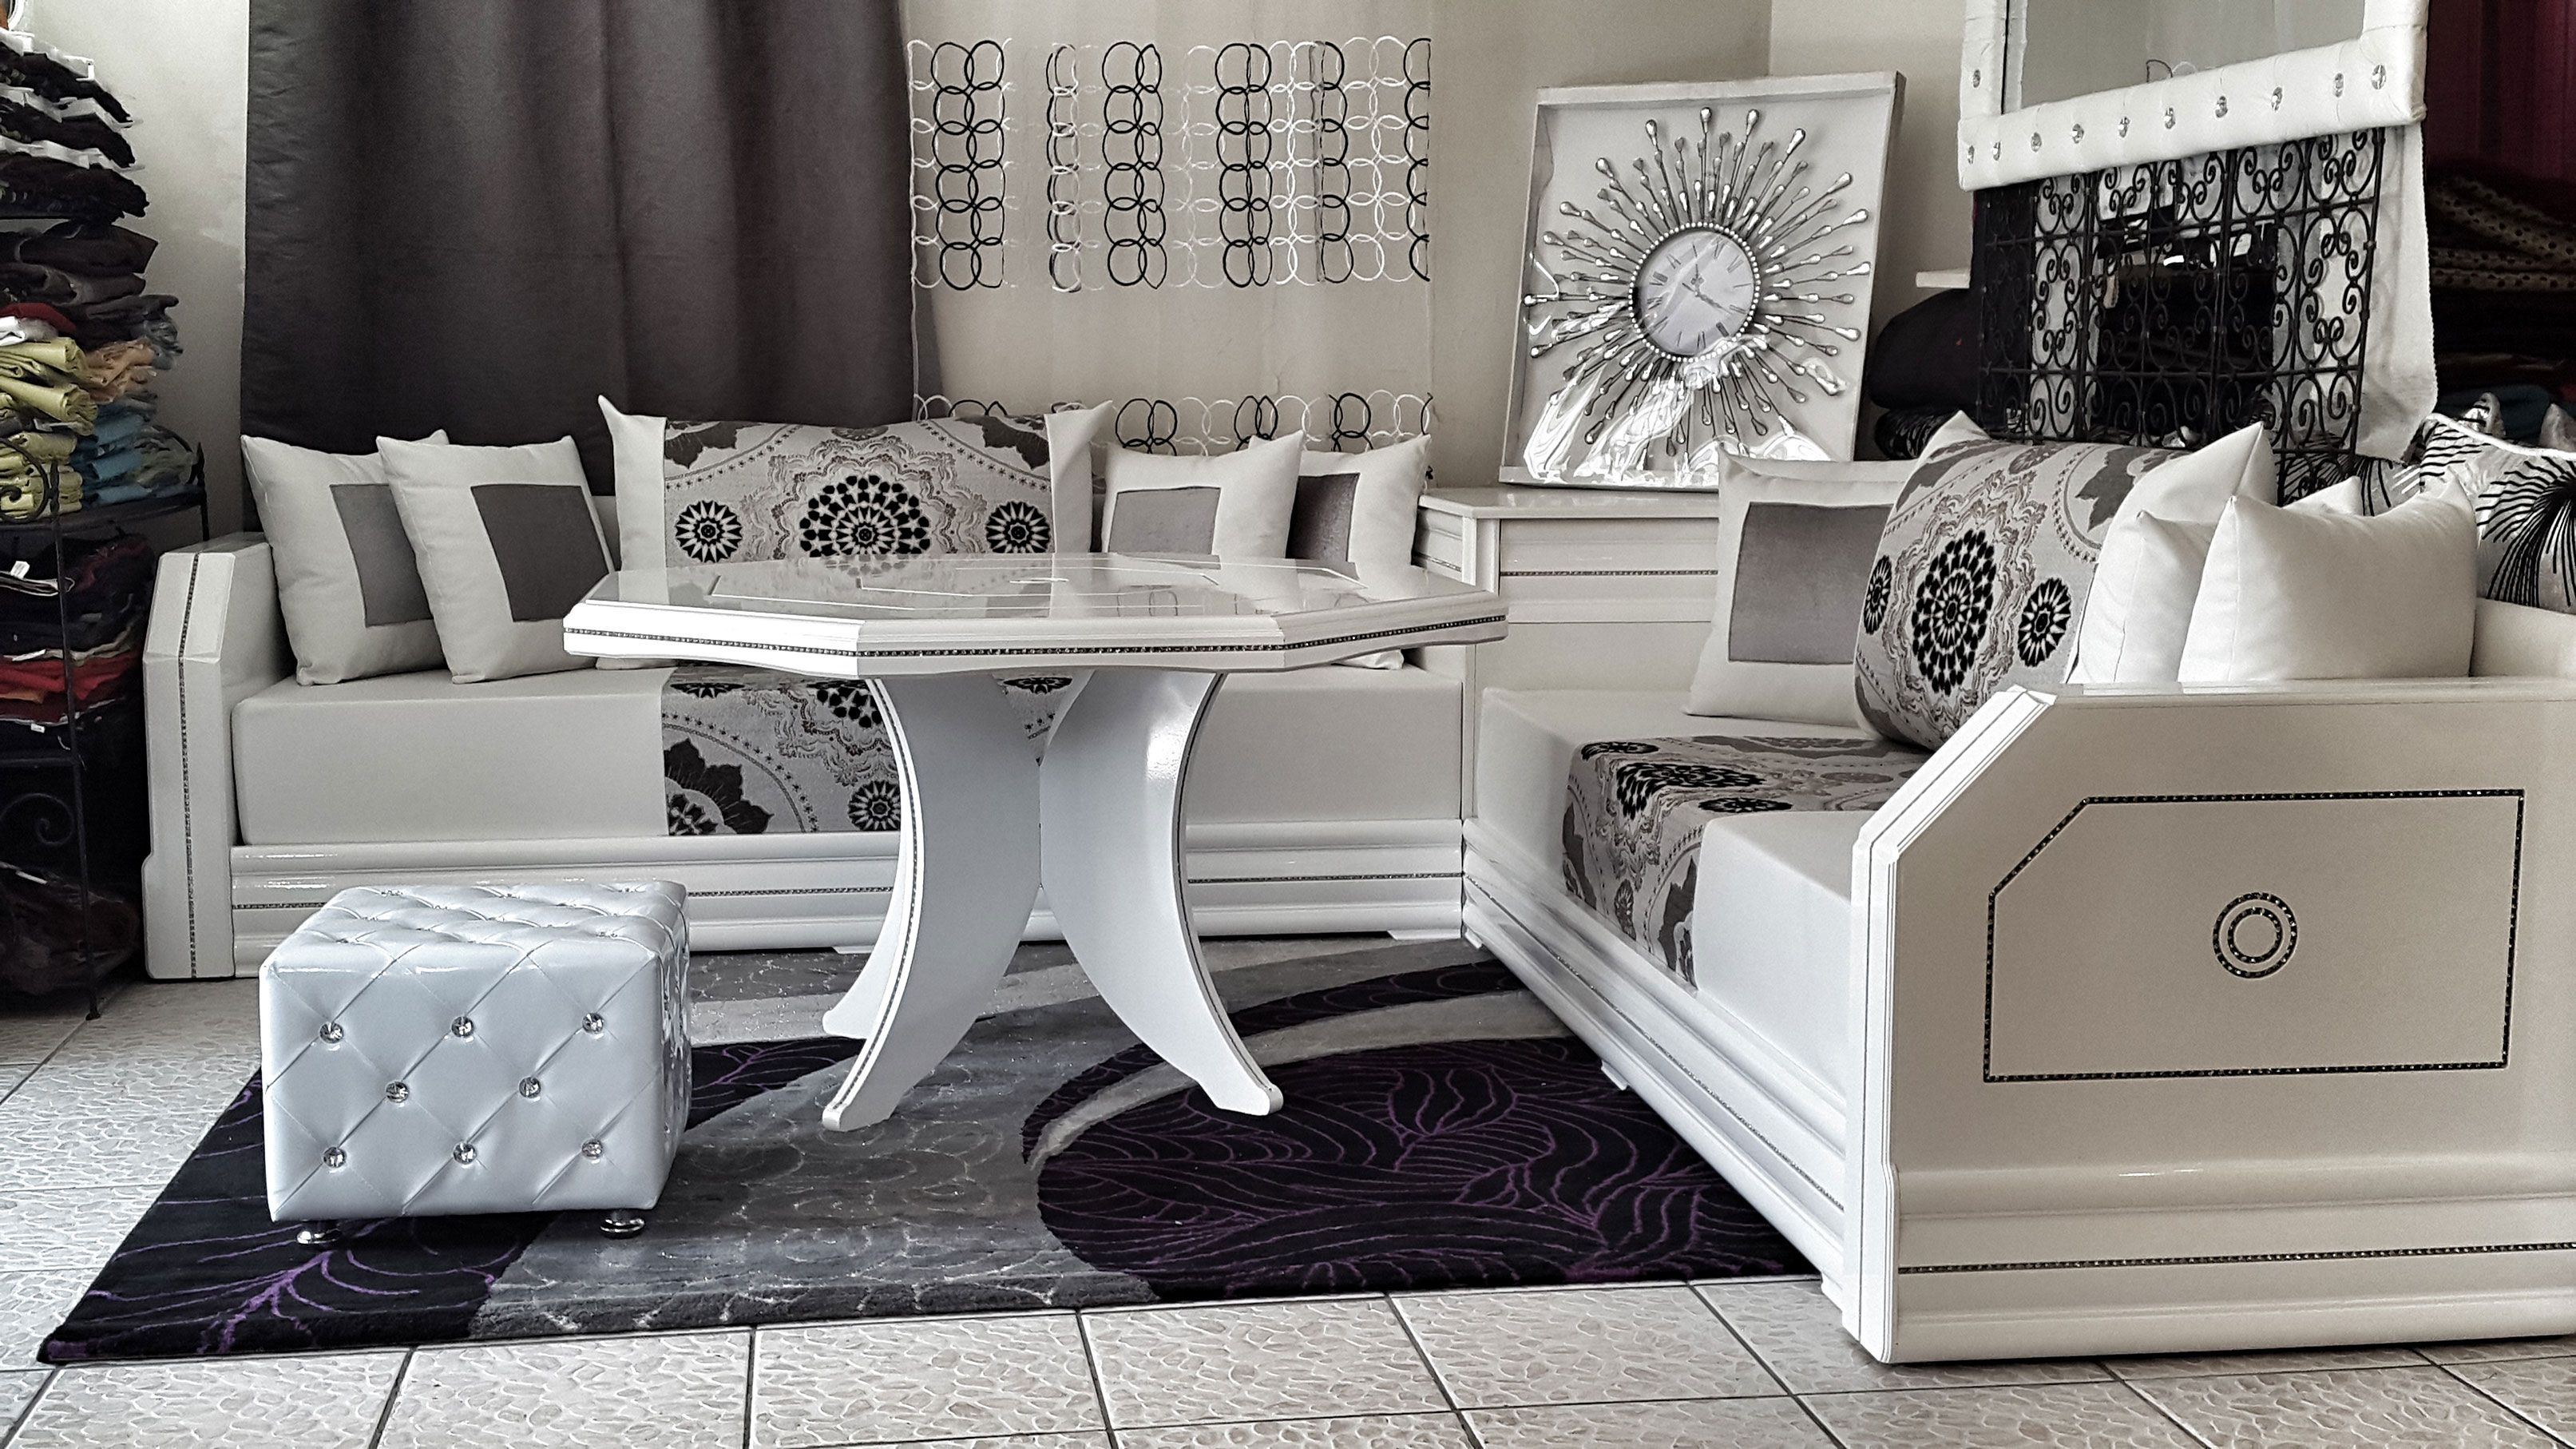 Accueil | Salon Marhaba, salon marocain paris, salon ... | Déco ...